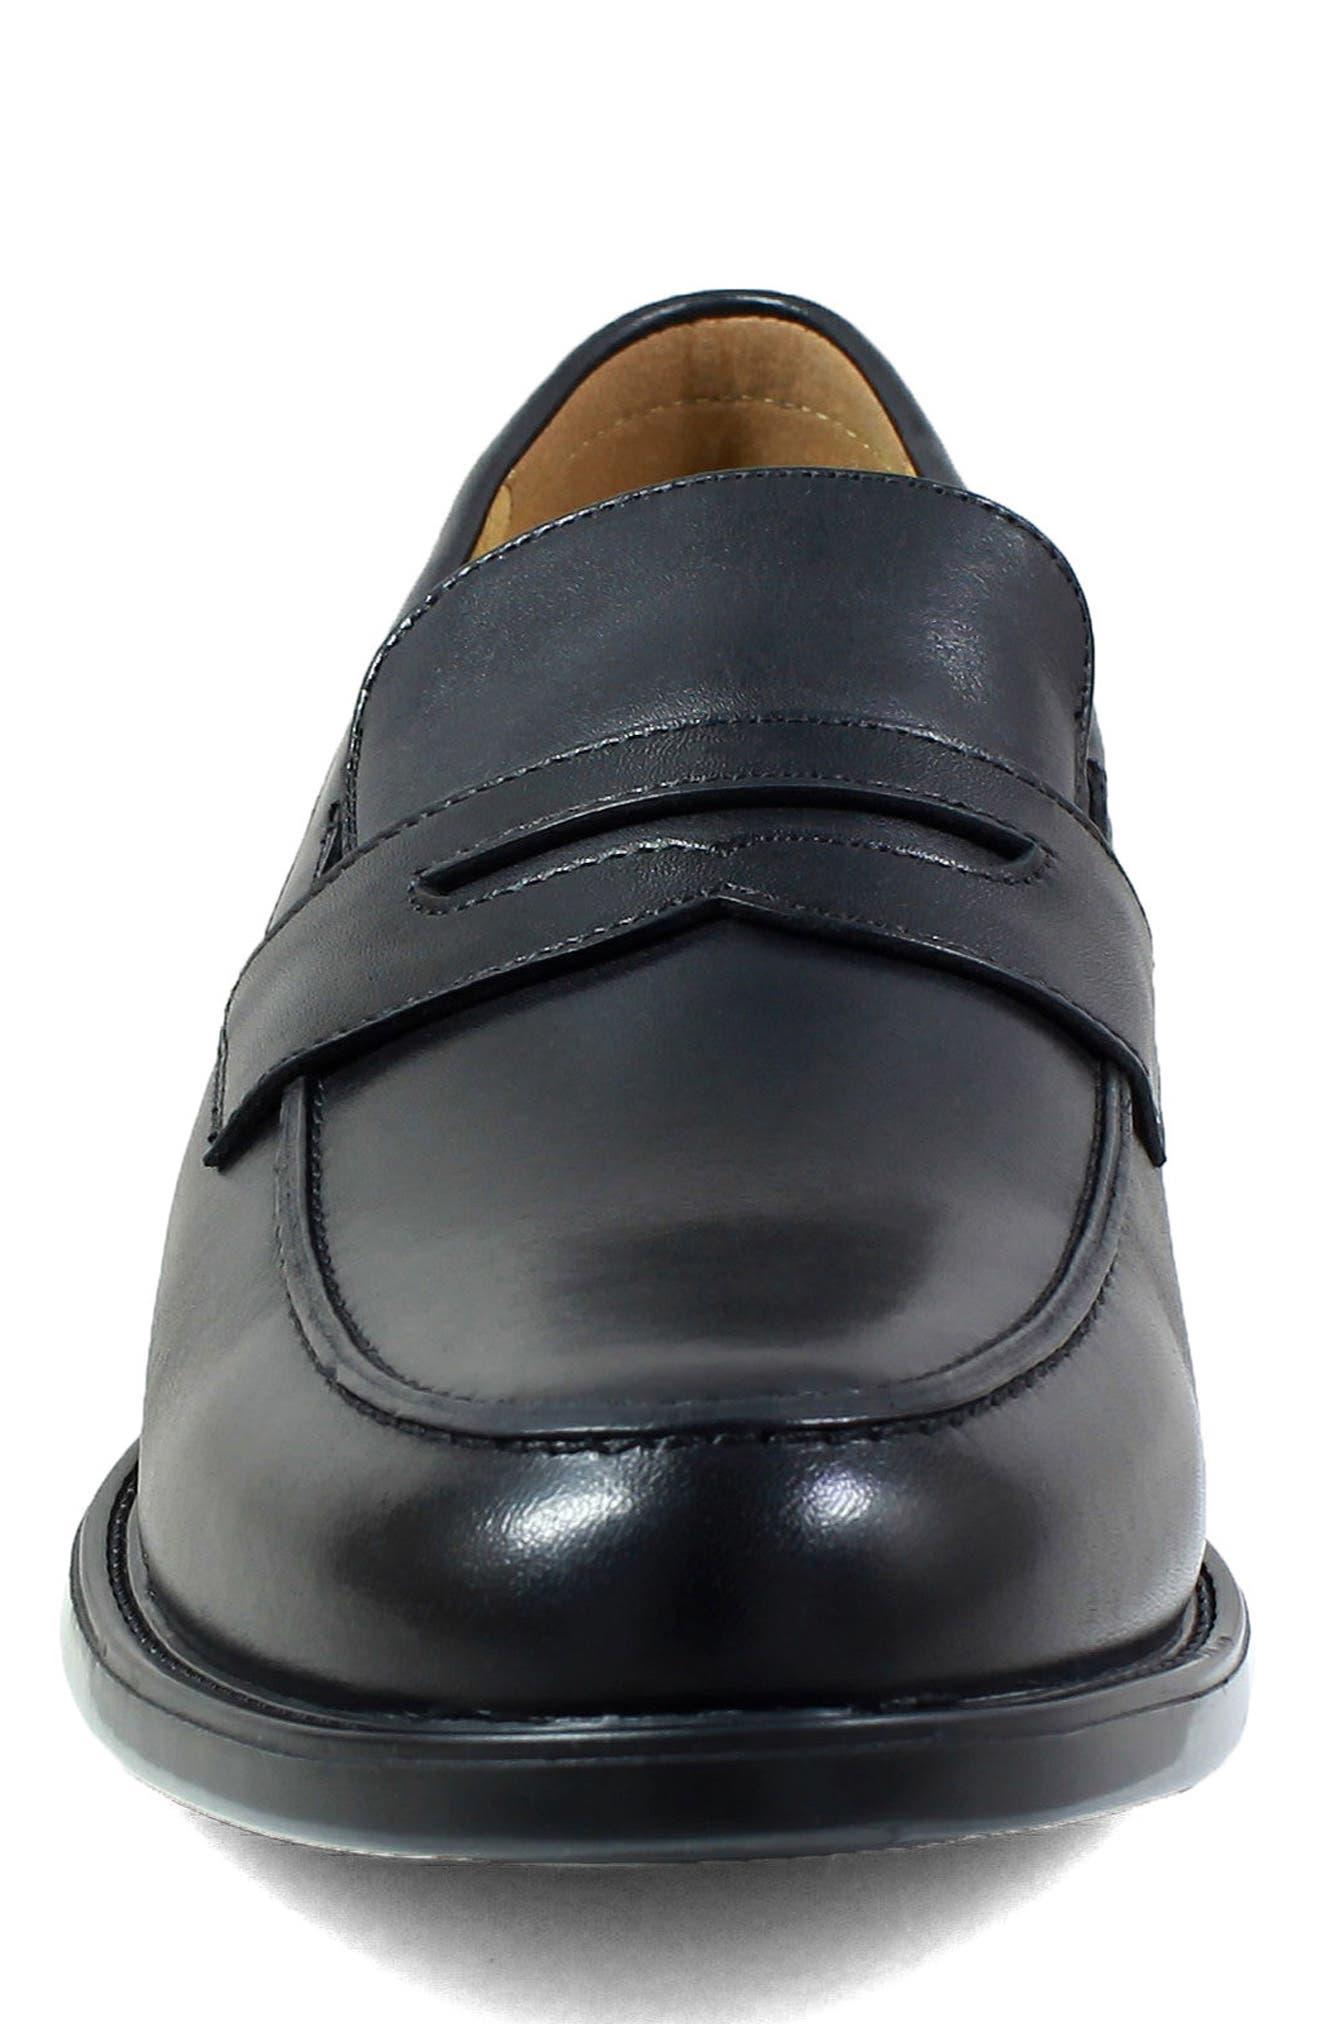 Midtown Penny Loafer,                             Alternate thumbnail 4, color,                             Black